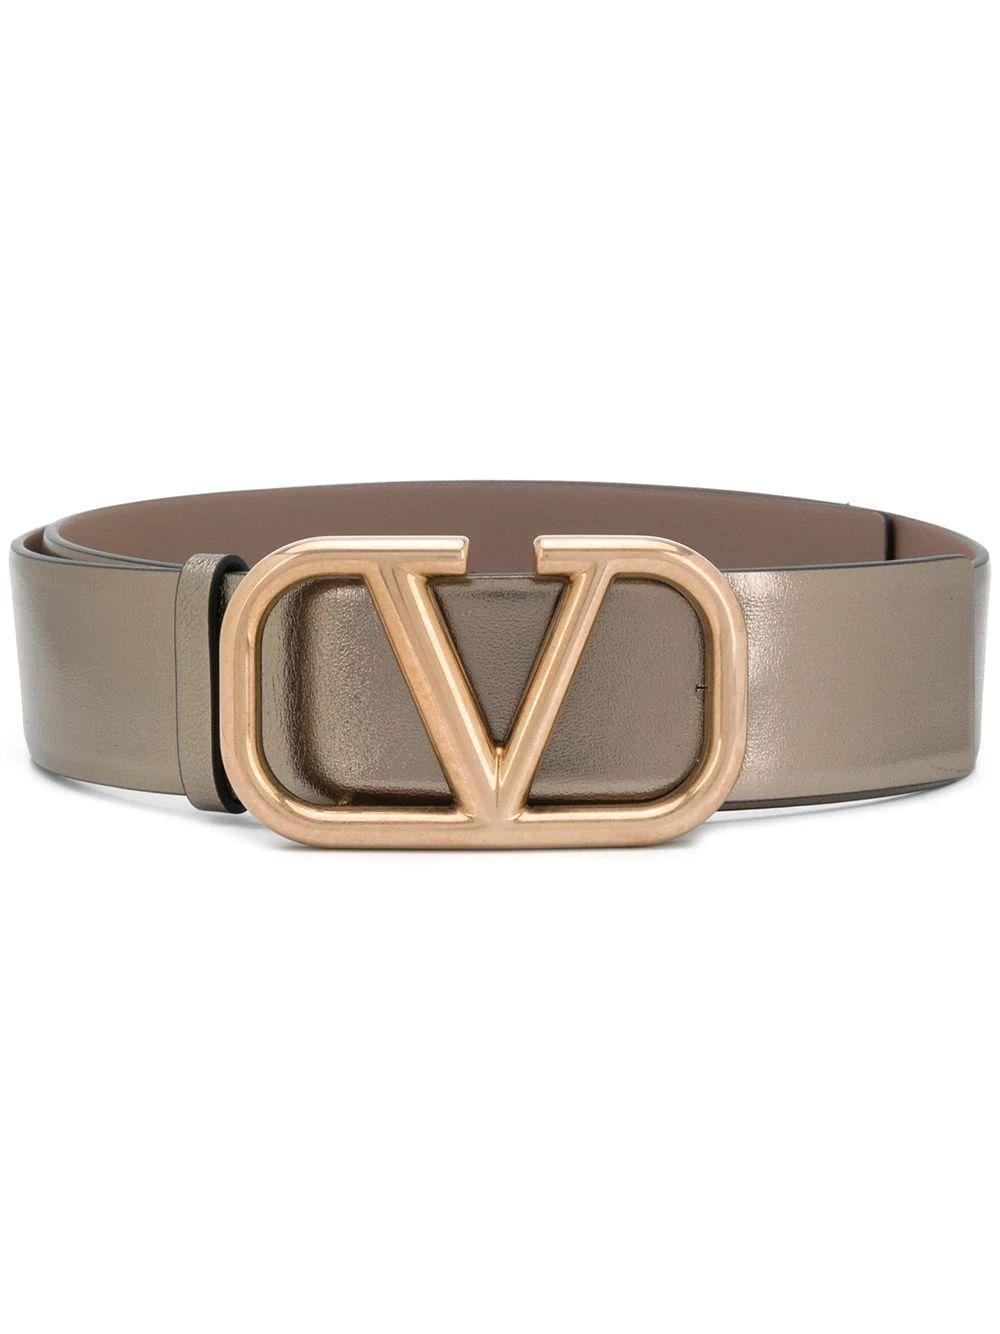 V- Logo 40mm Belt Item # UW2T0S11VLH